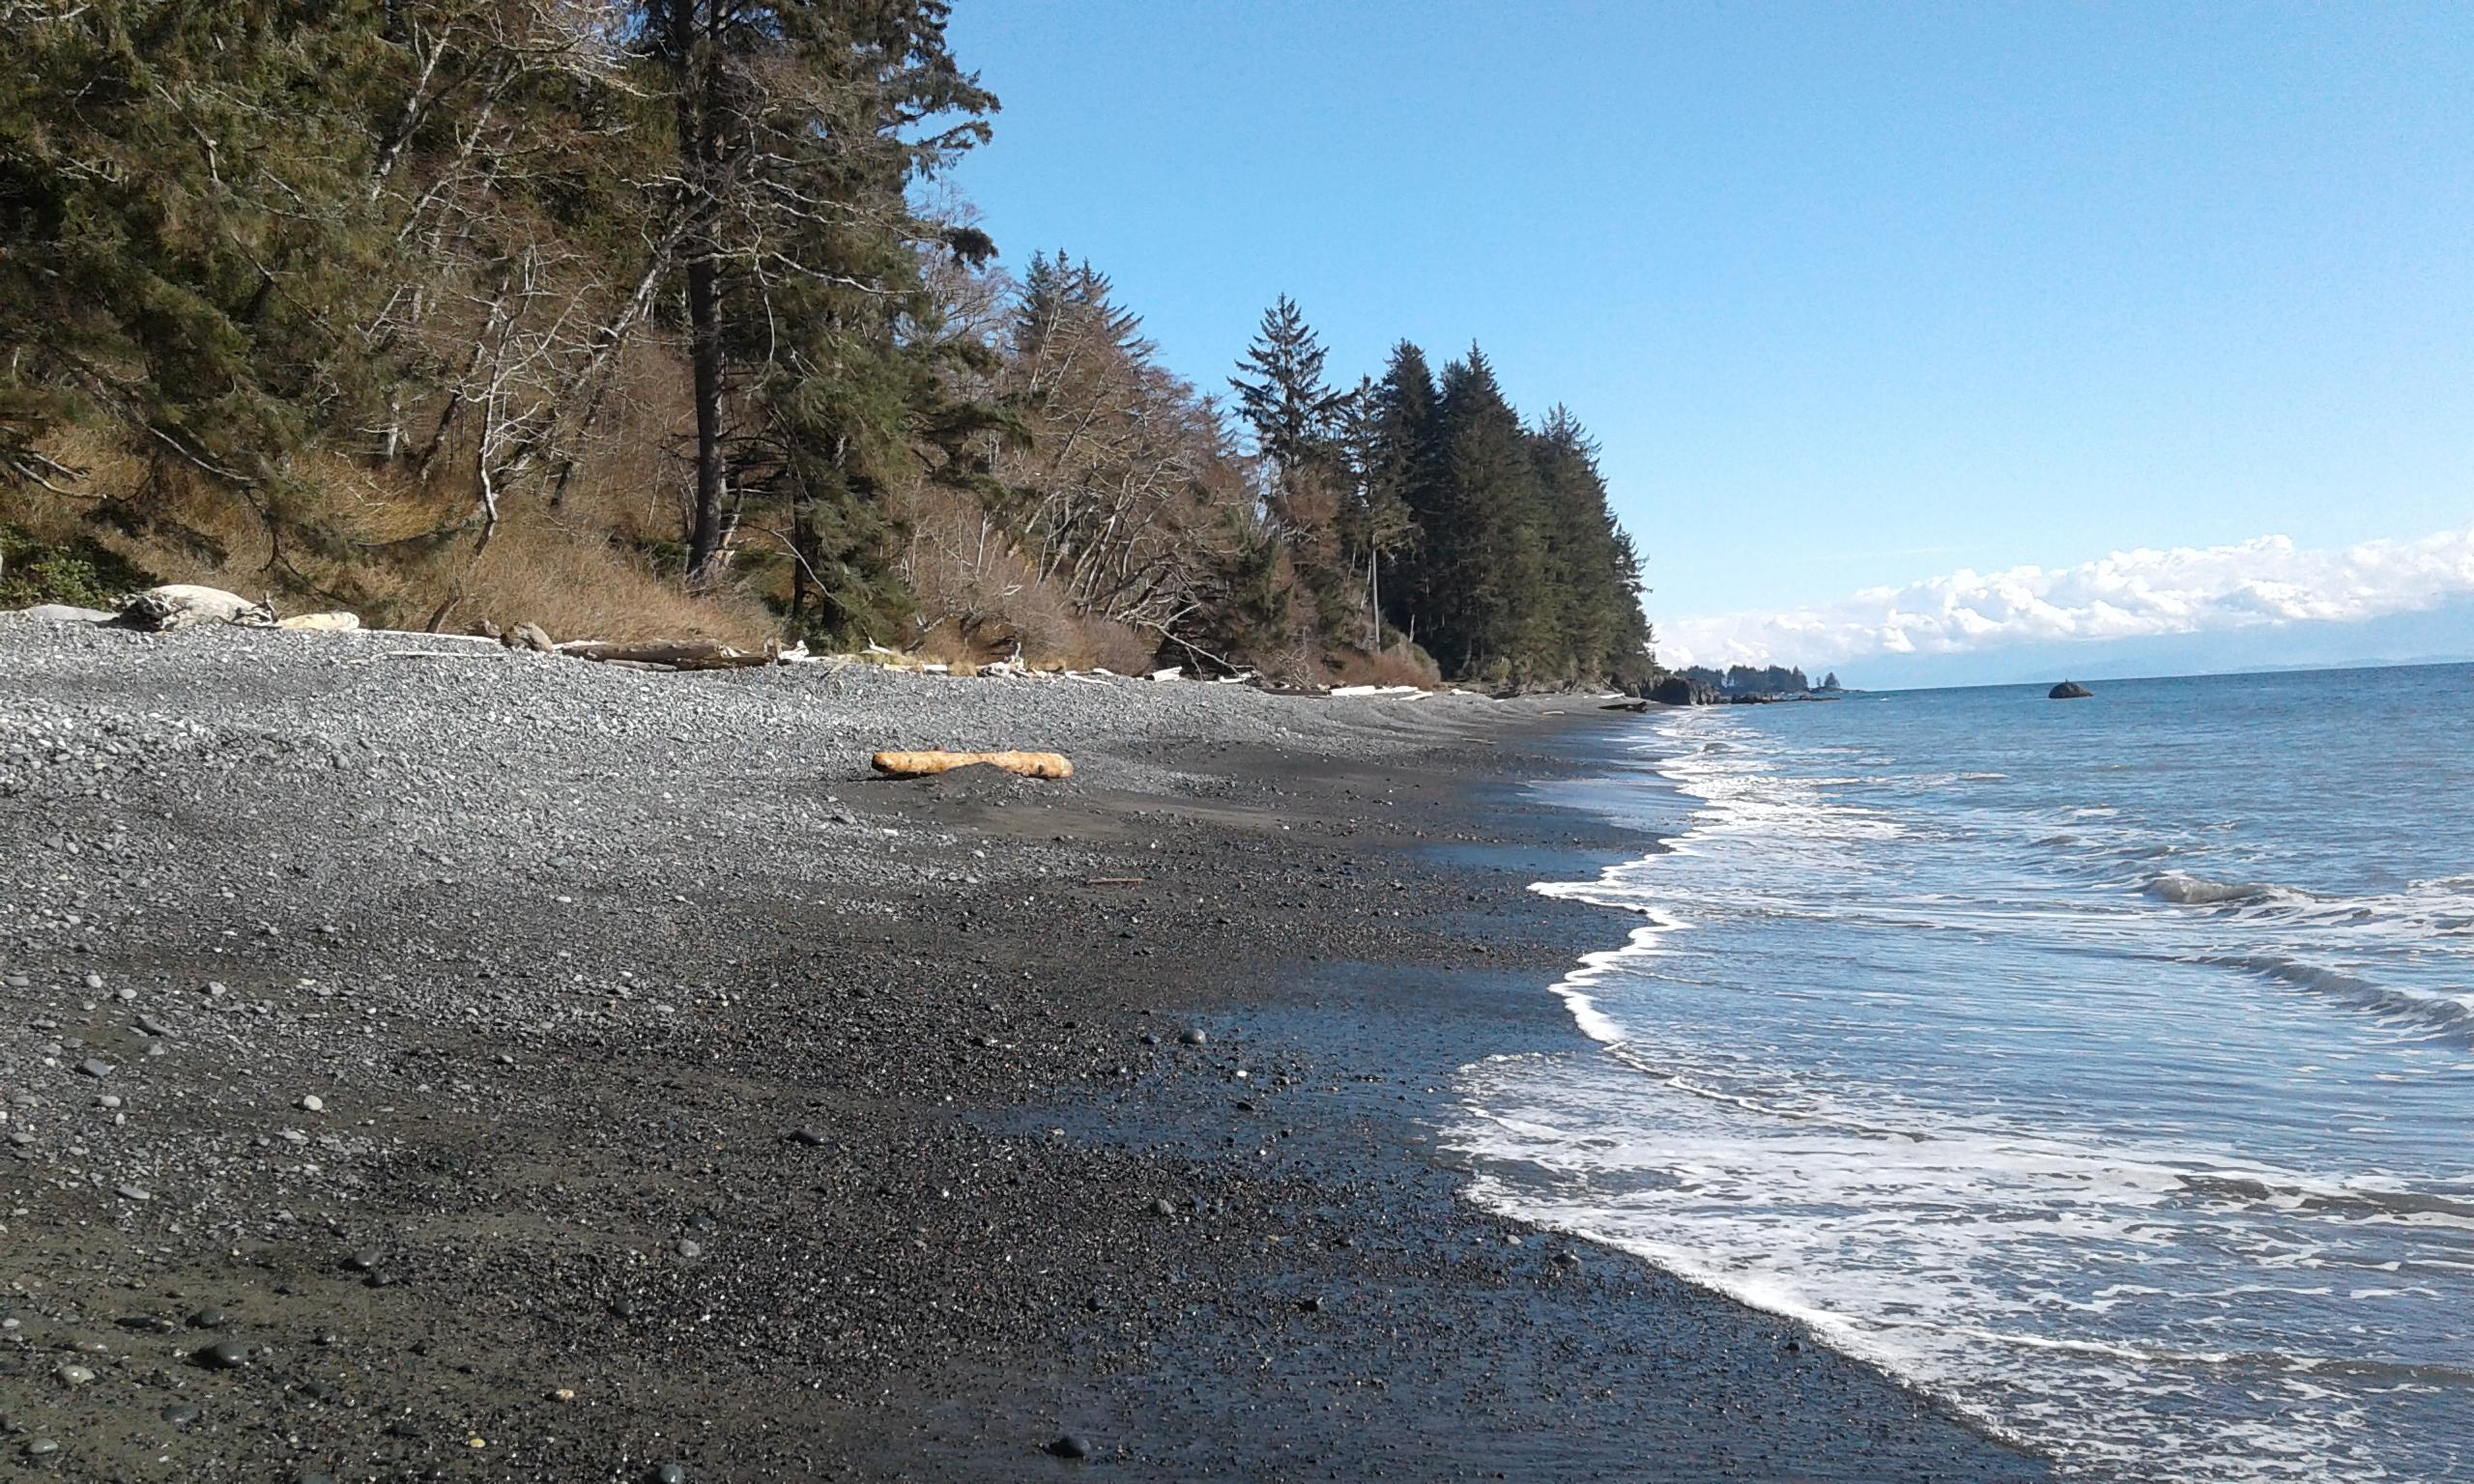 Parkinson Beach